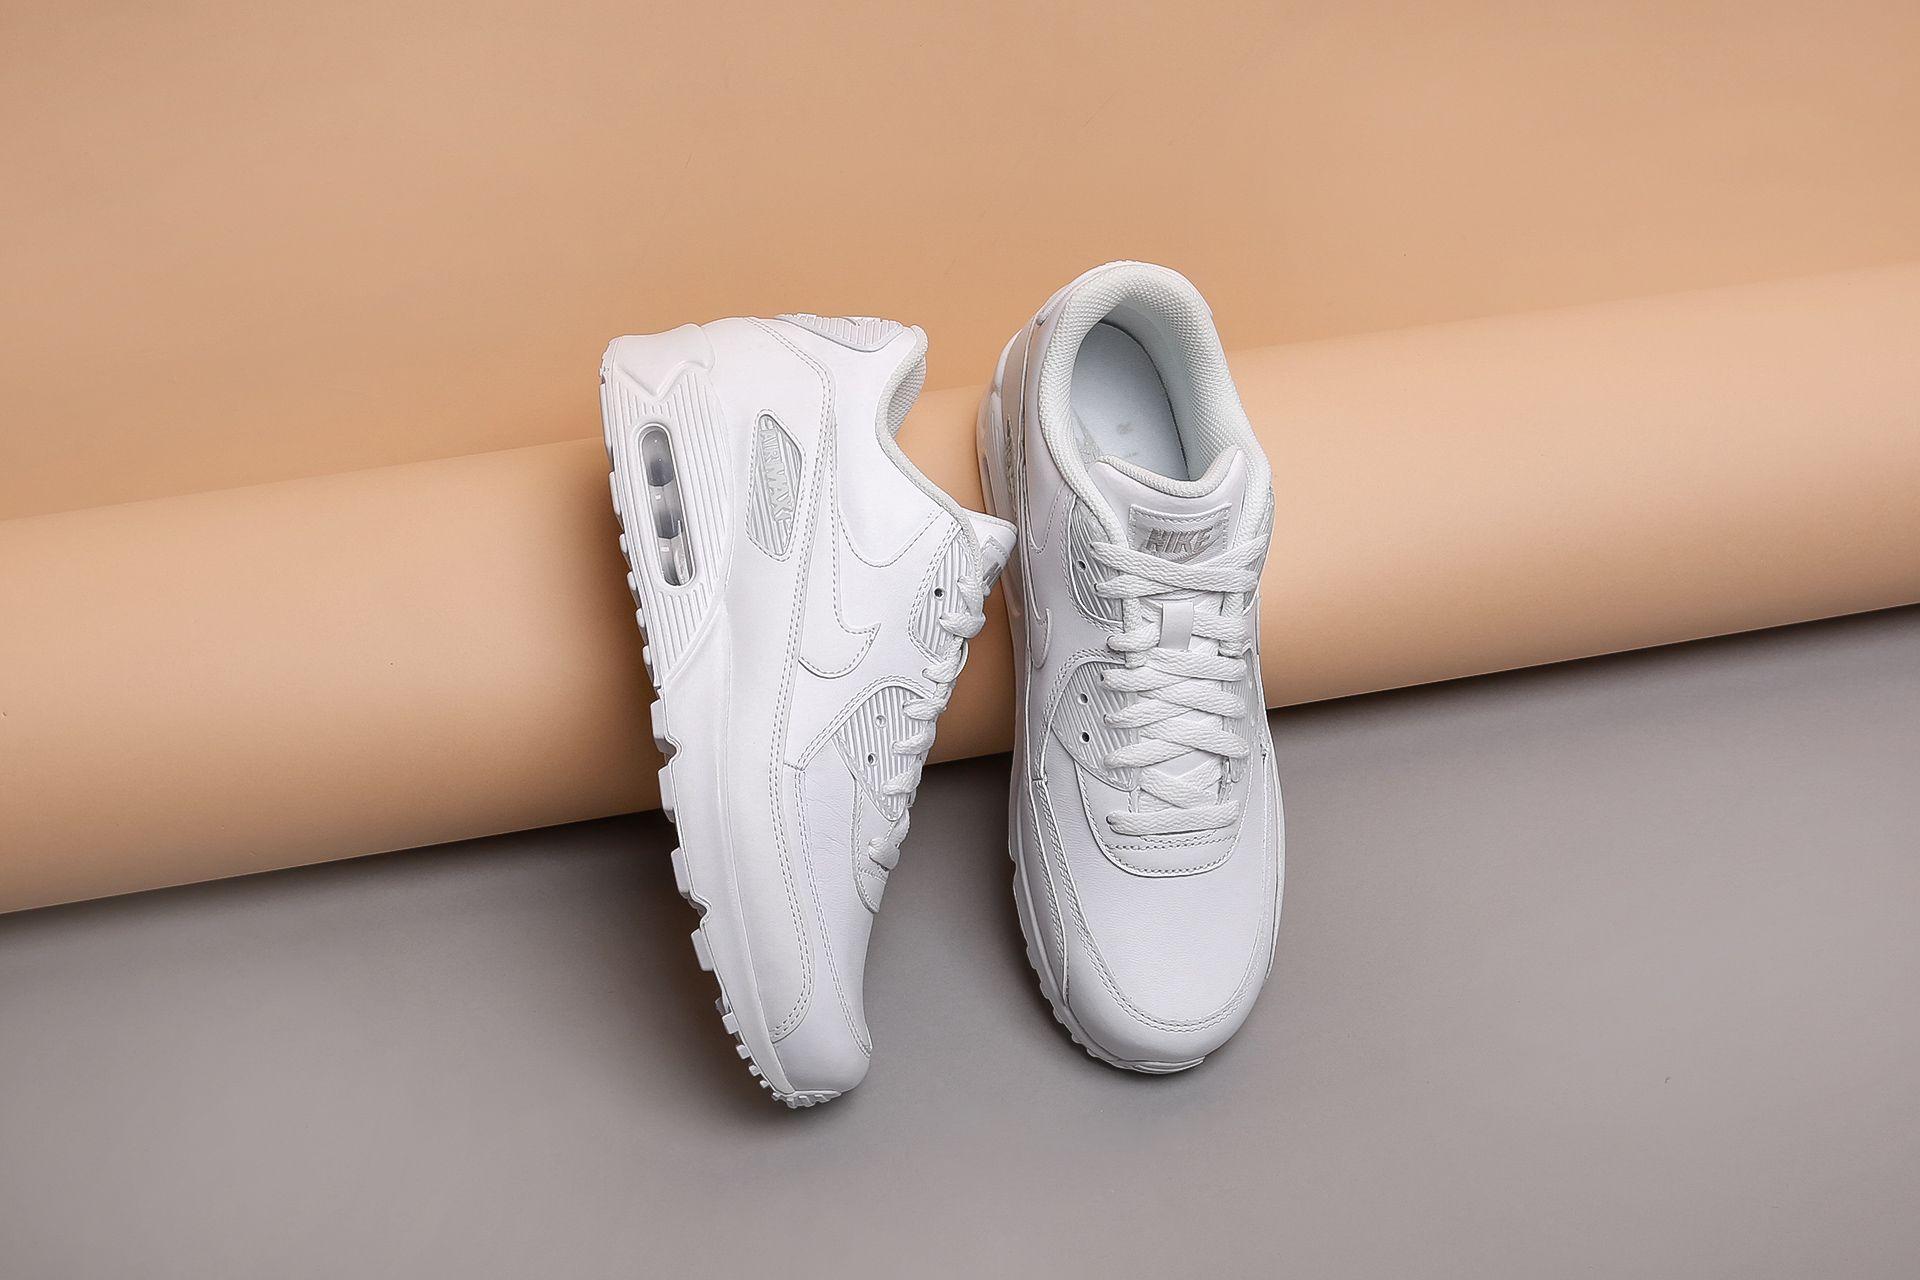 9a074991 ... Купить мужские белые кроссовки Nike Air Max 90 Leather - фото 4  картинки ...